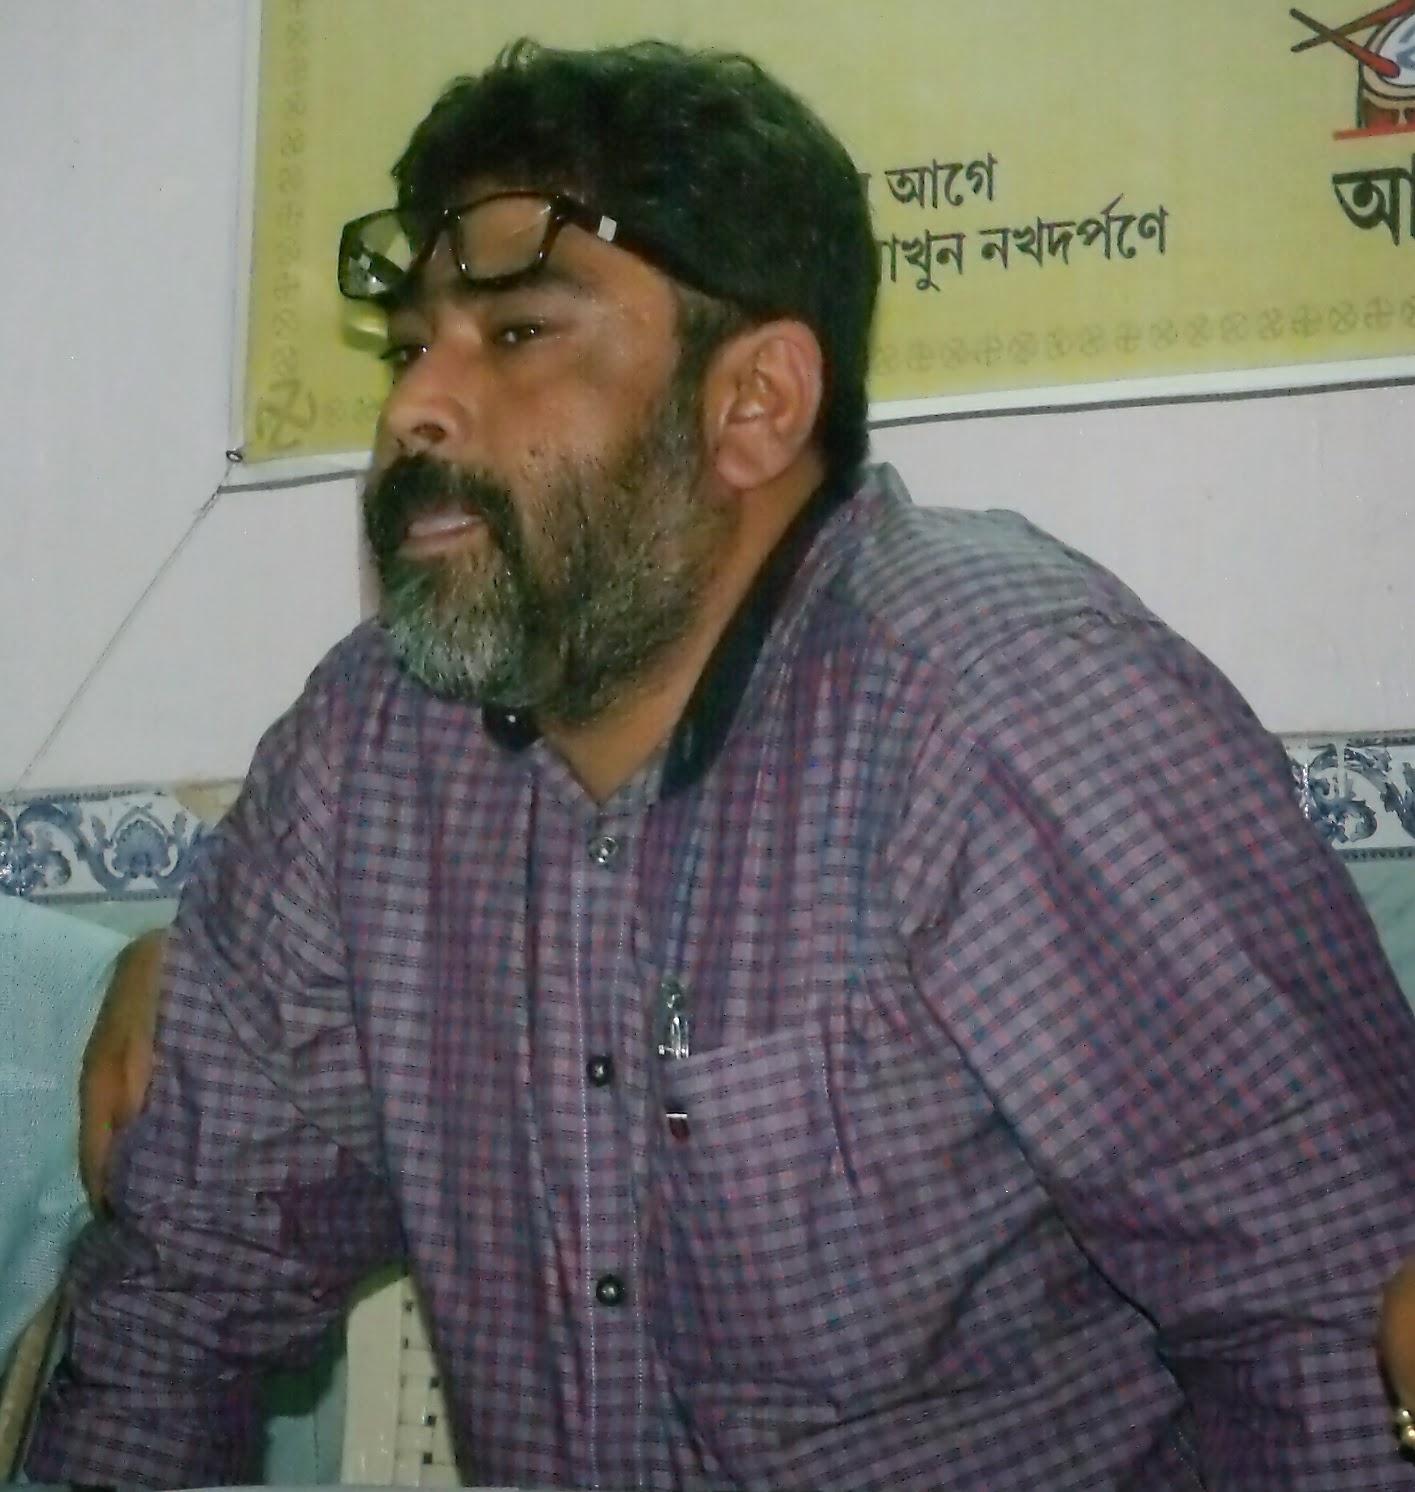 Hirak Bandyopadhyay News Editor Anandabazar Patrika , ABP Group - Hirak_Bandyopadhyay_News_Editor_%2BAnandabazar_Patrika_ABP_Group_2014